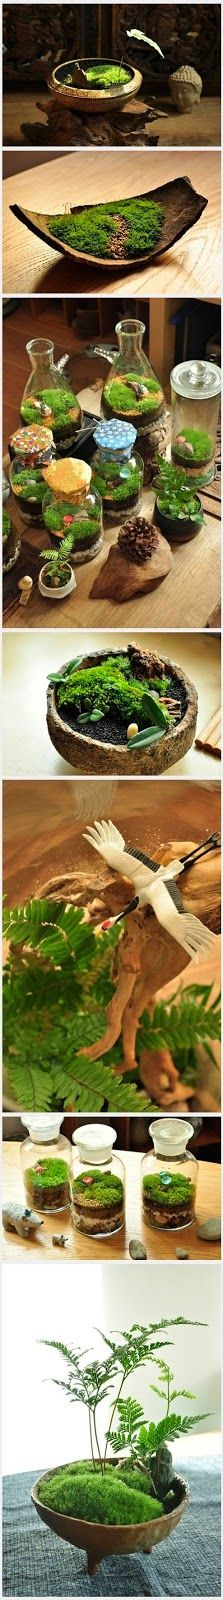 Moss gardens, How Quaint....